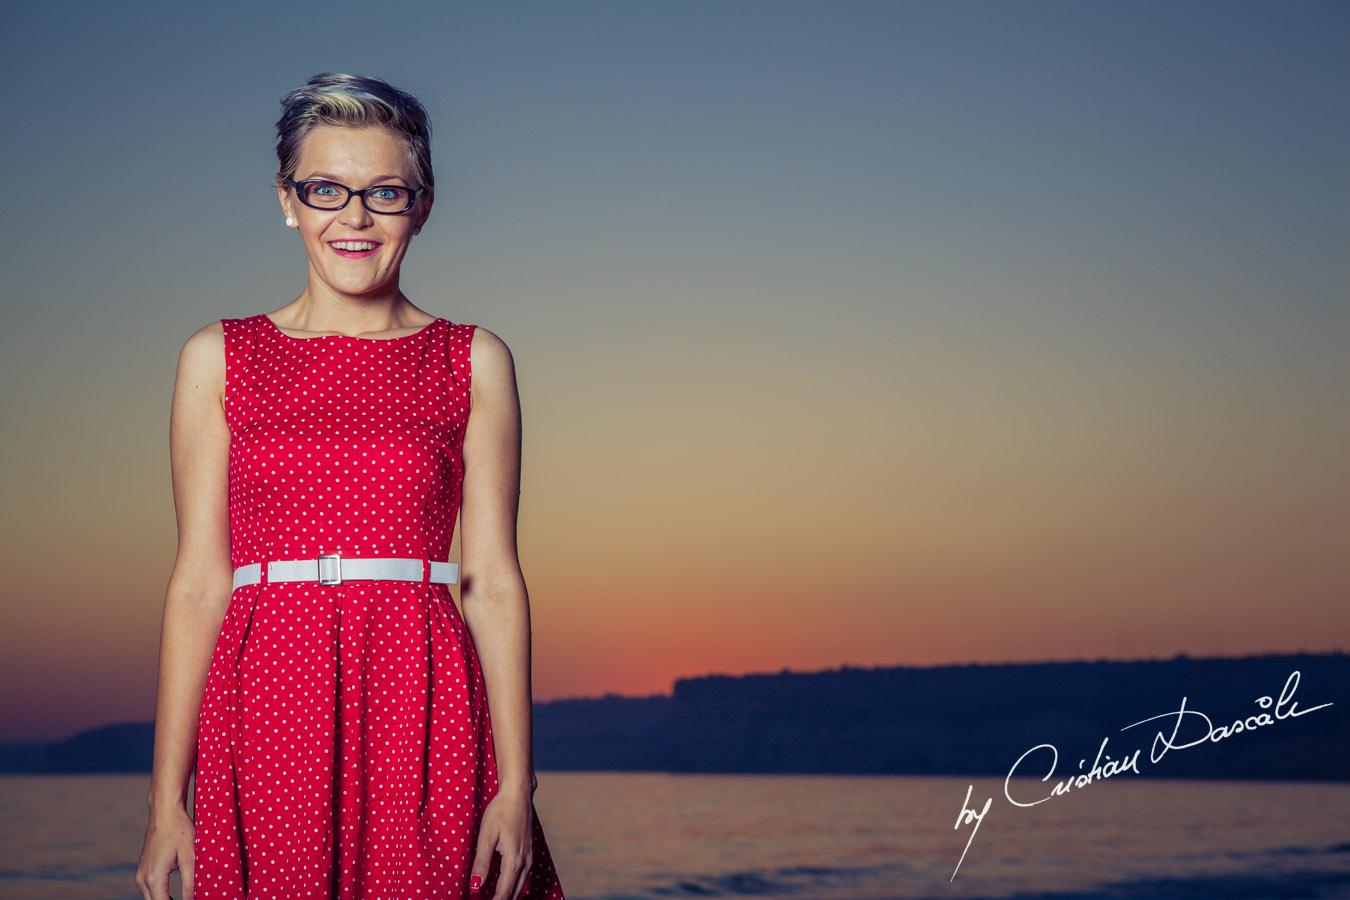 Beach photo shoot in Cyprus - Maria, Moods. Cyprus Photographer: Cristian Dascalu